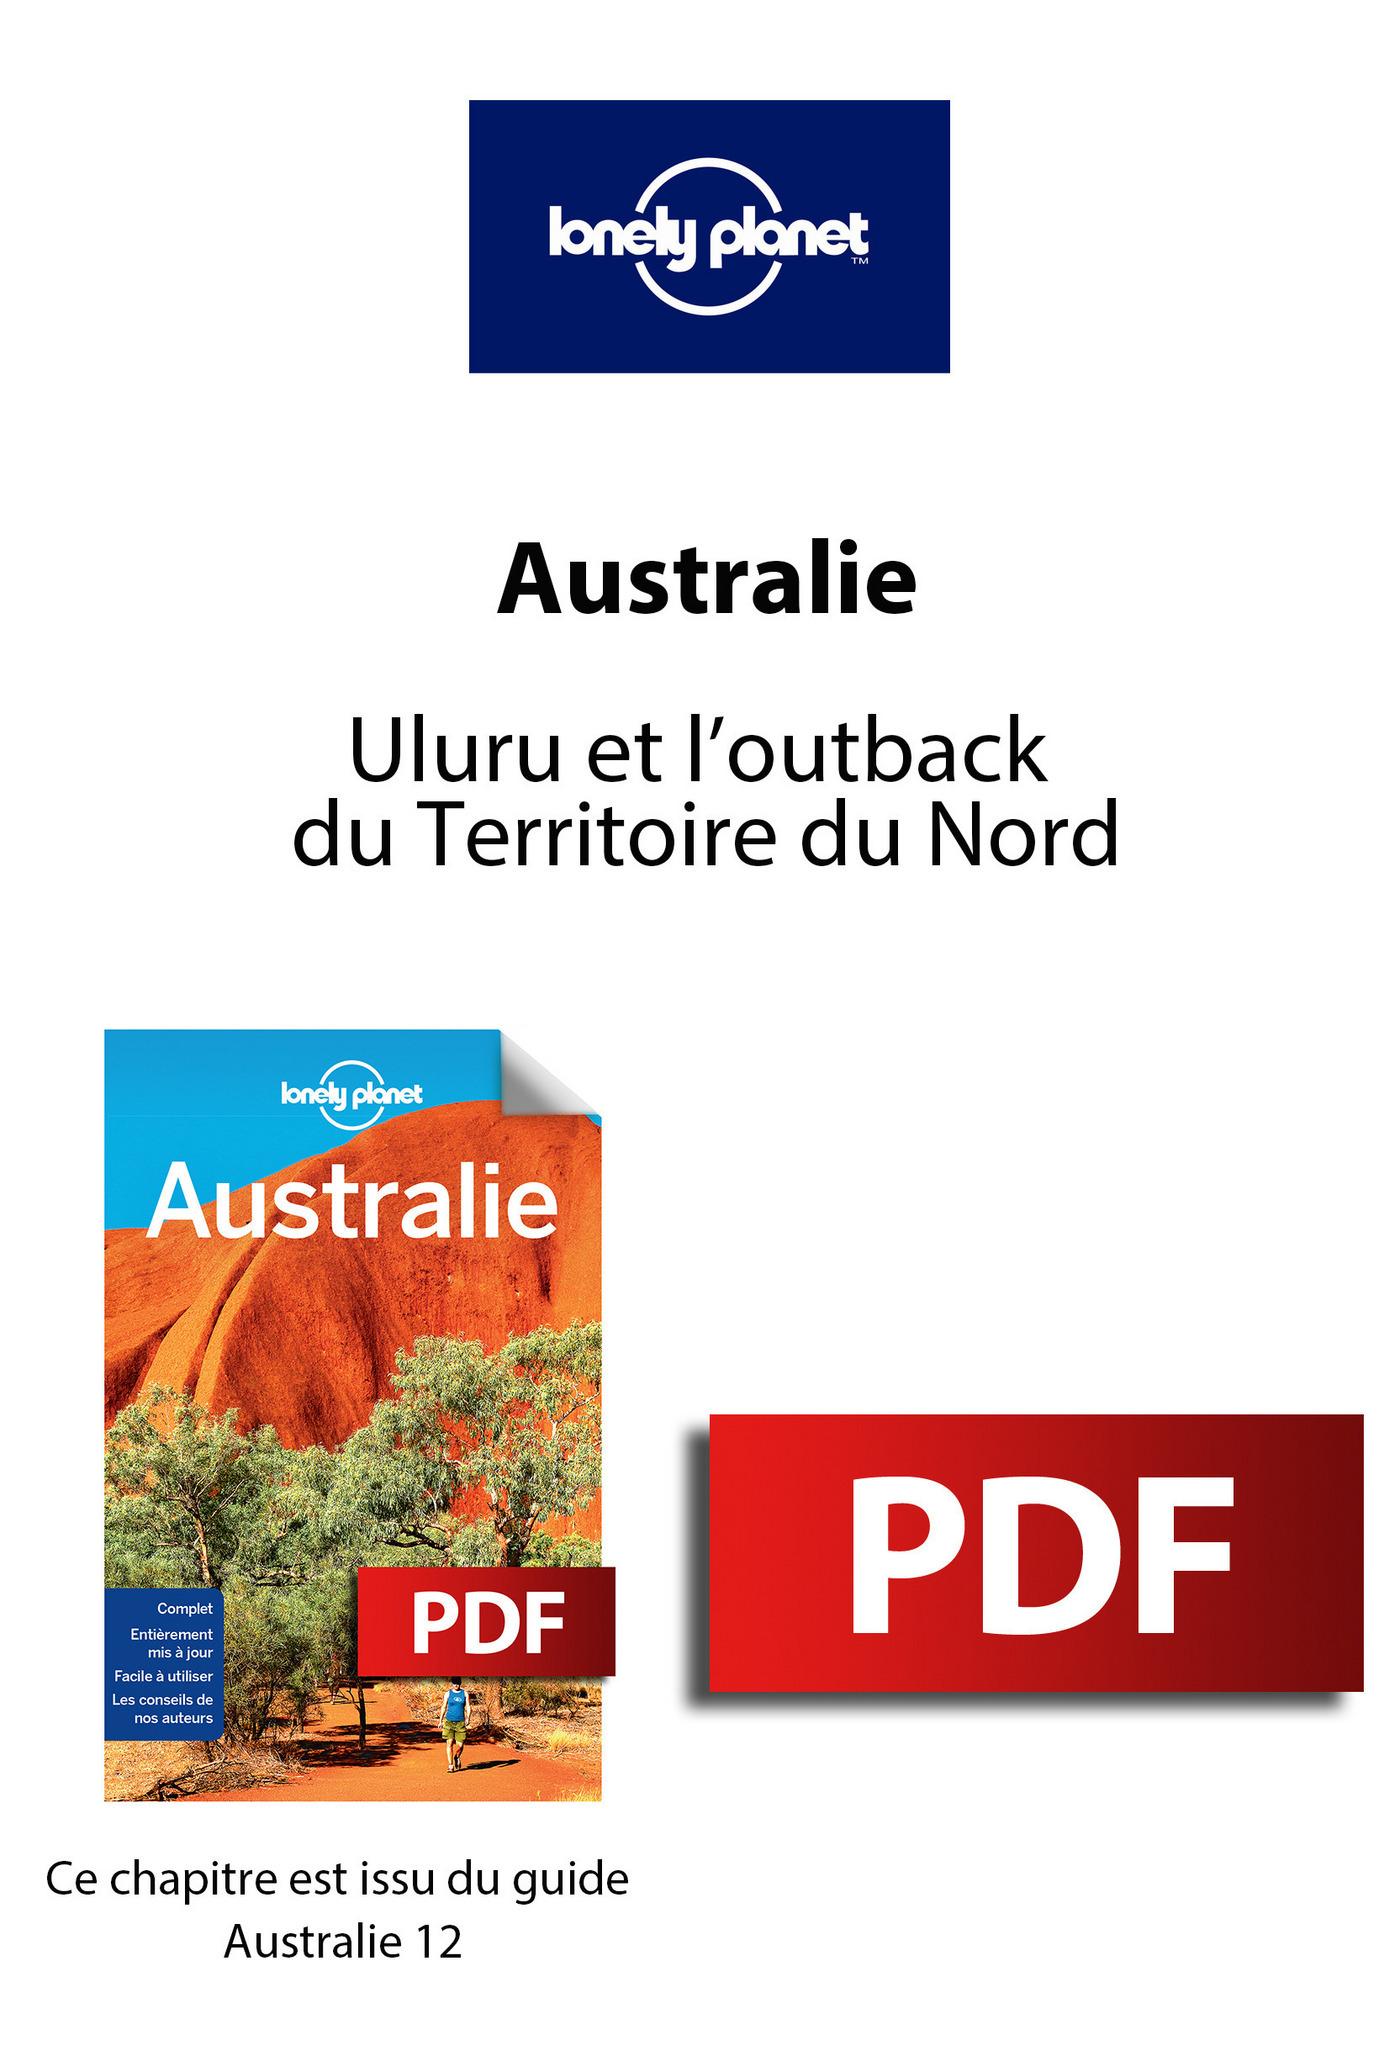 Australie - Uluru et l'outback du Territoire du Nord